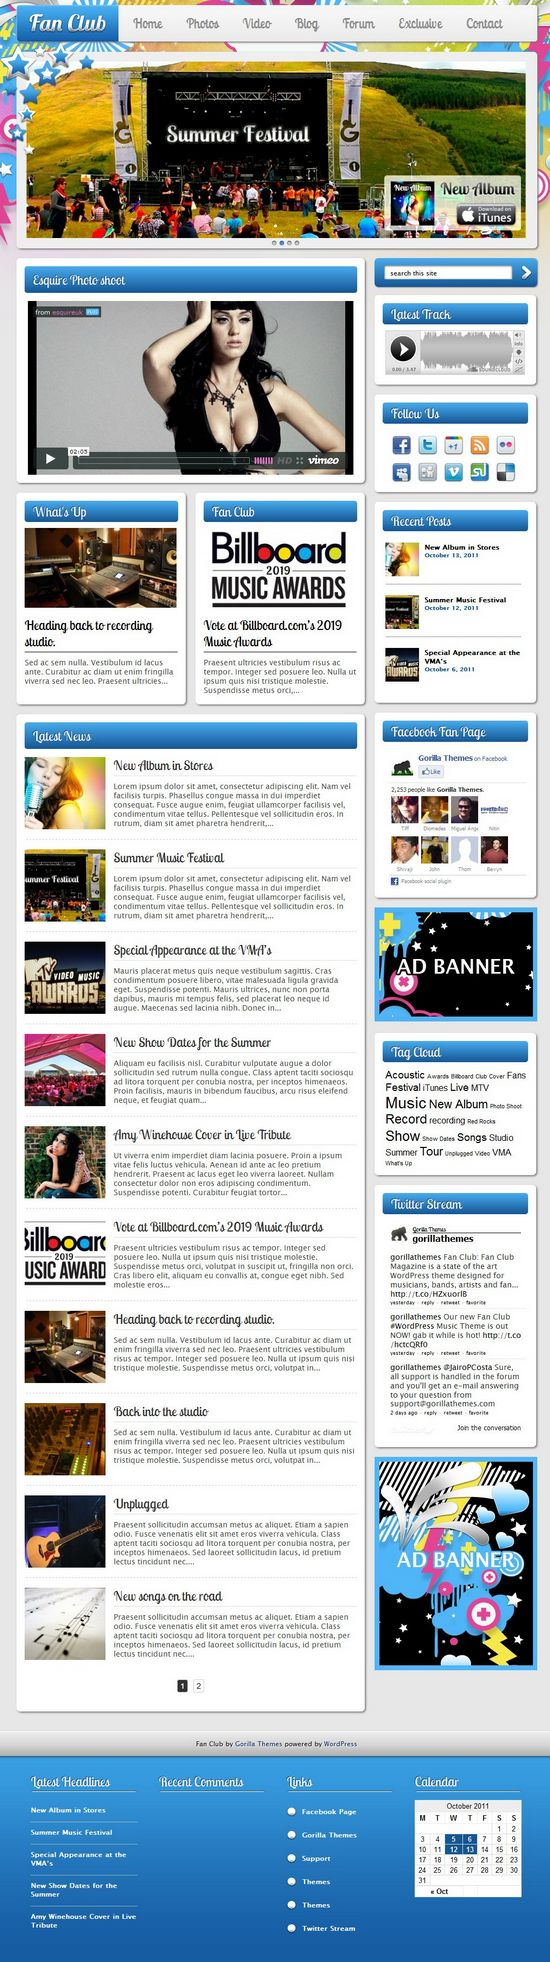 fan club gorilla themes avjthemescom - Fan Club WordPress Theme